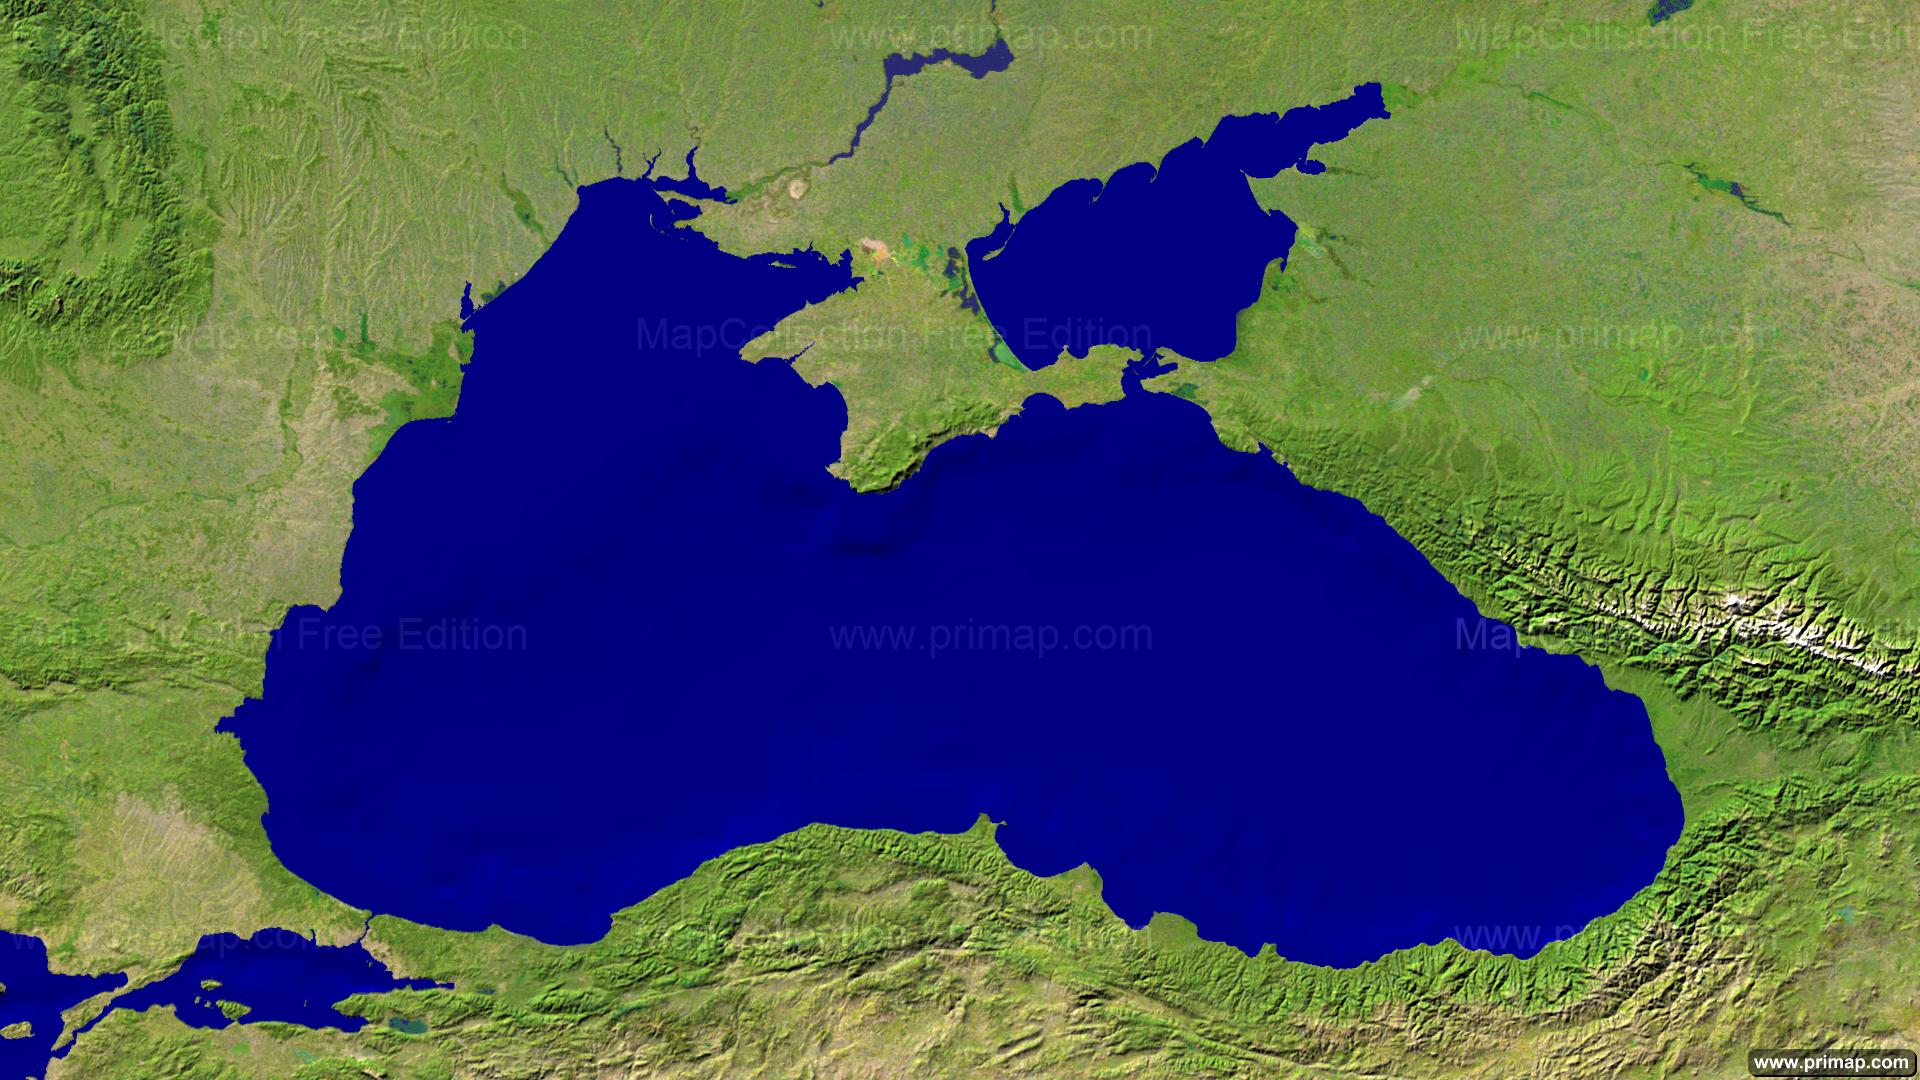 Primap marine charts black sea satellite 1920x1080 show map gumiabroncs Images